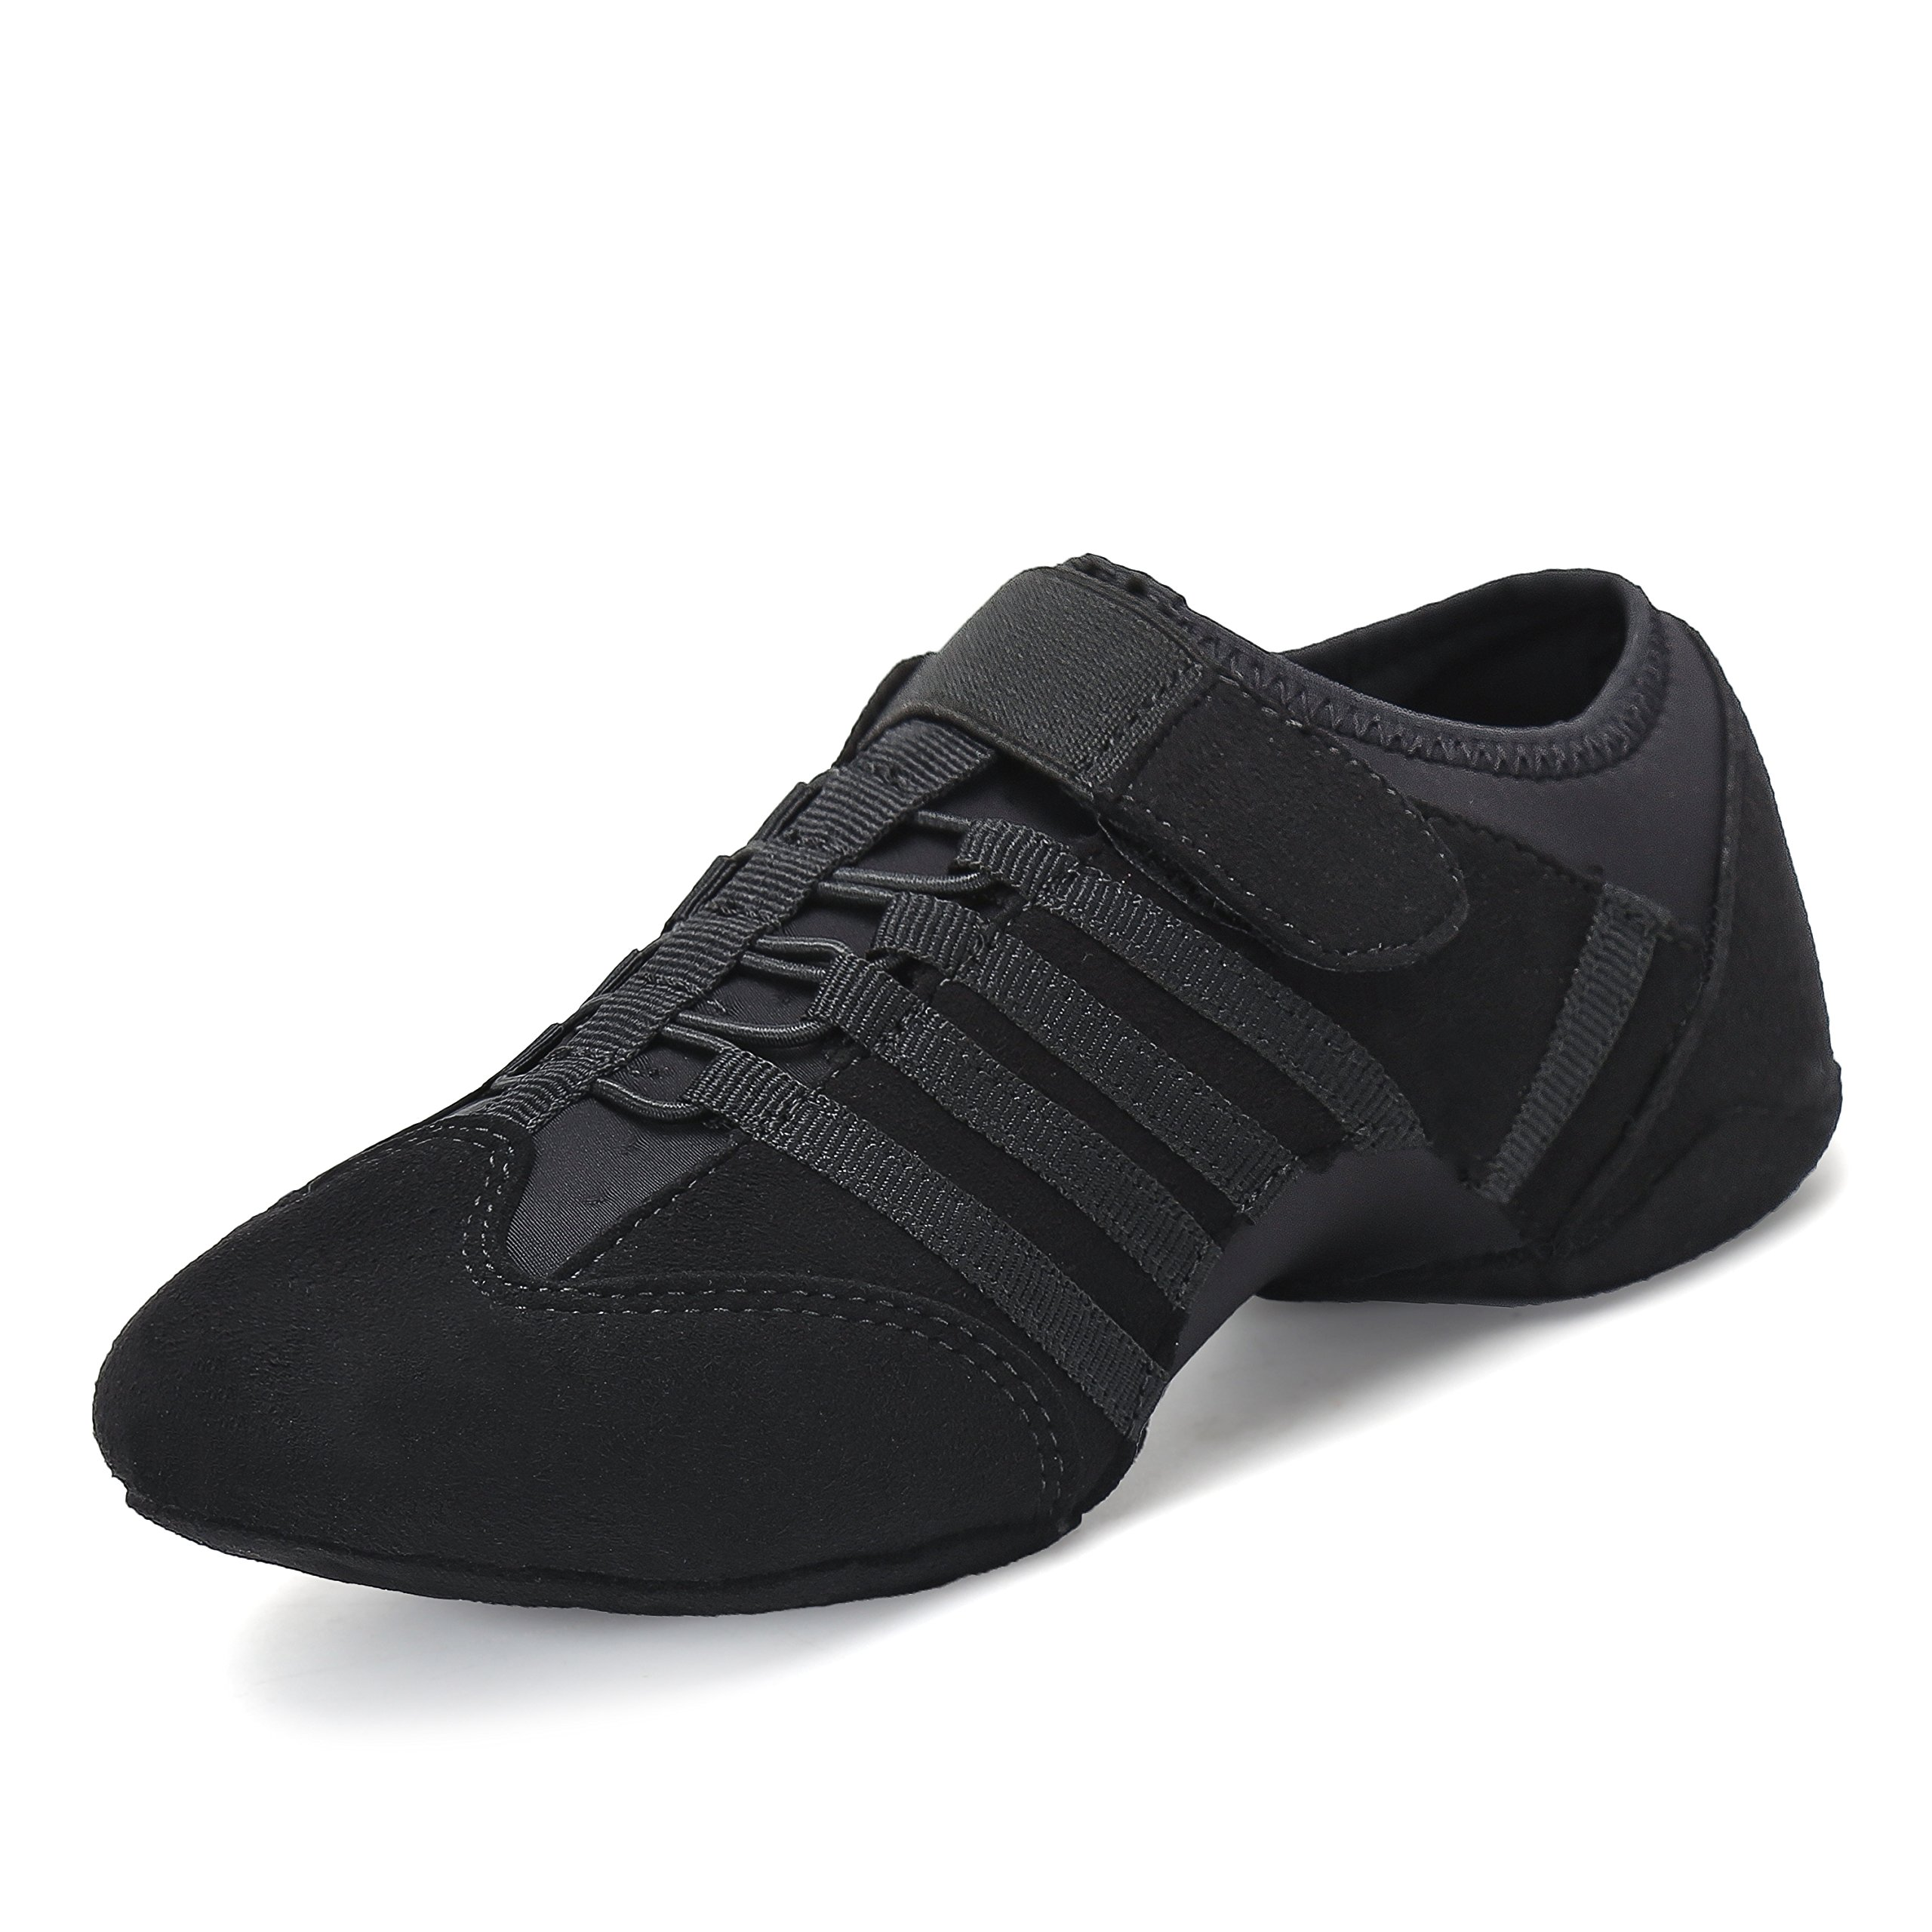 Jazz Shoes for Women Slip On Flexible Suede Girls Split Sole Ballet Dance Shoe Hook and Loop